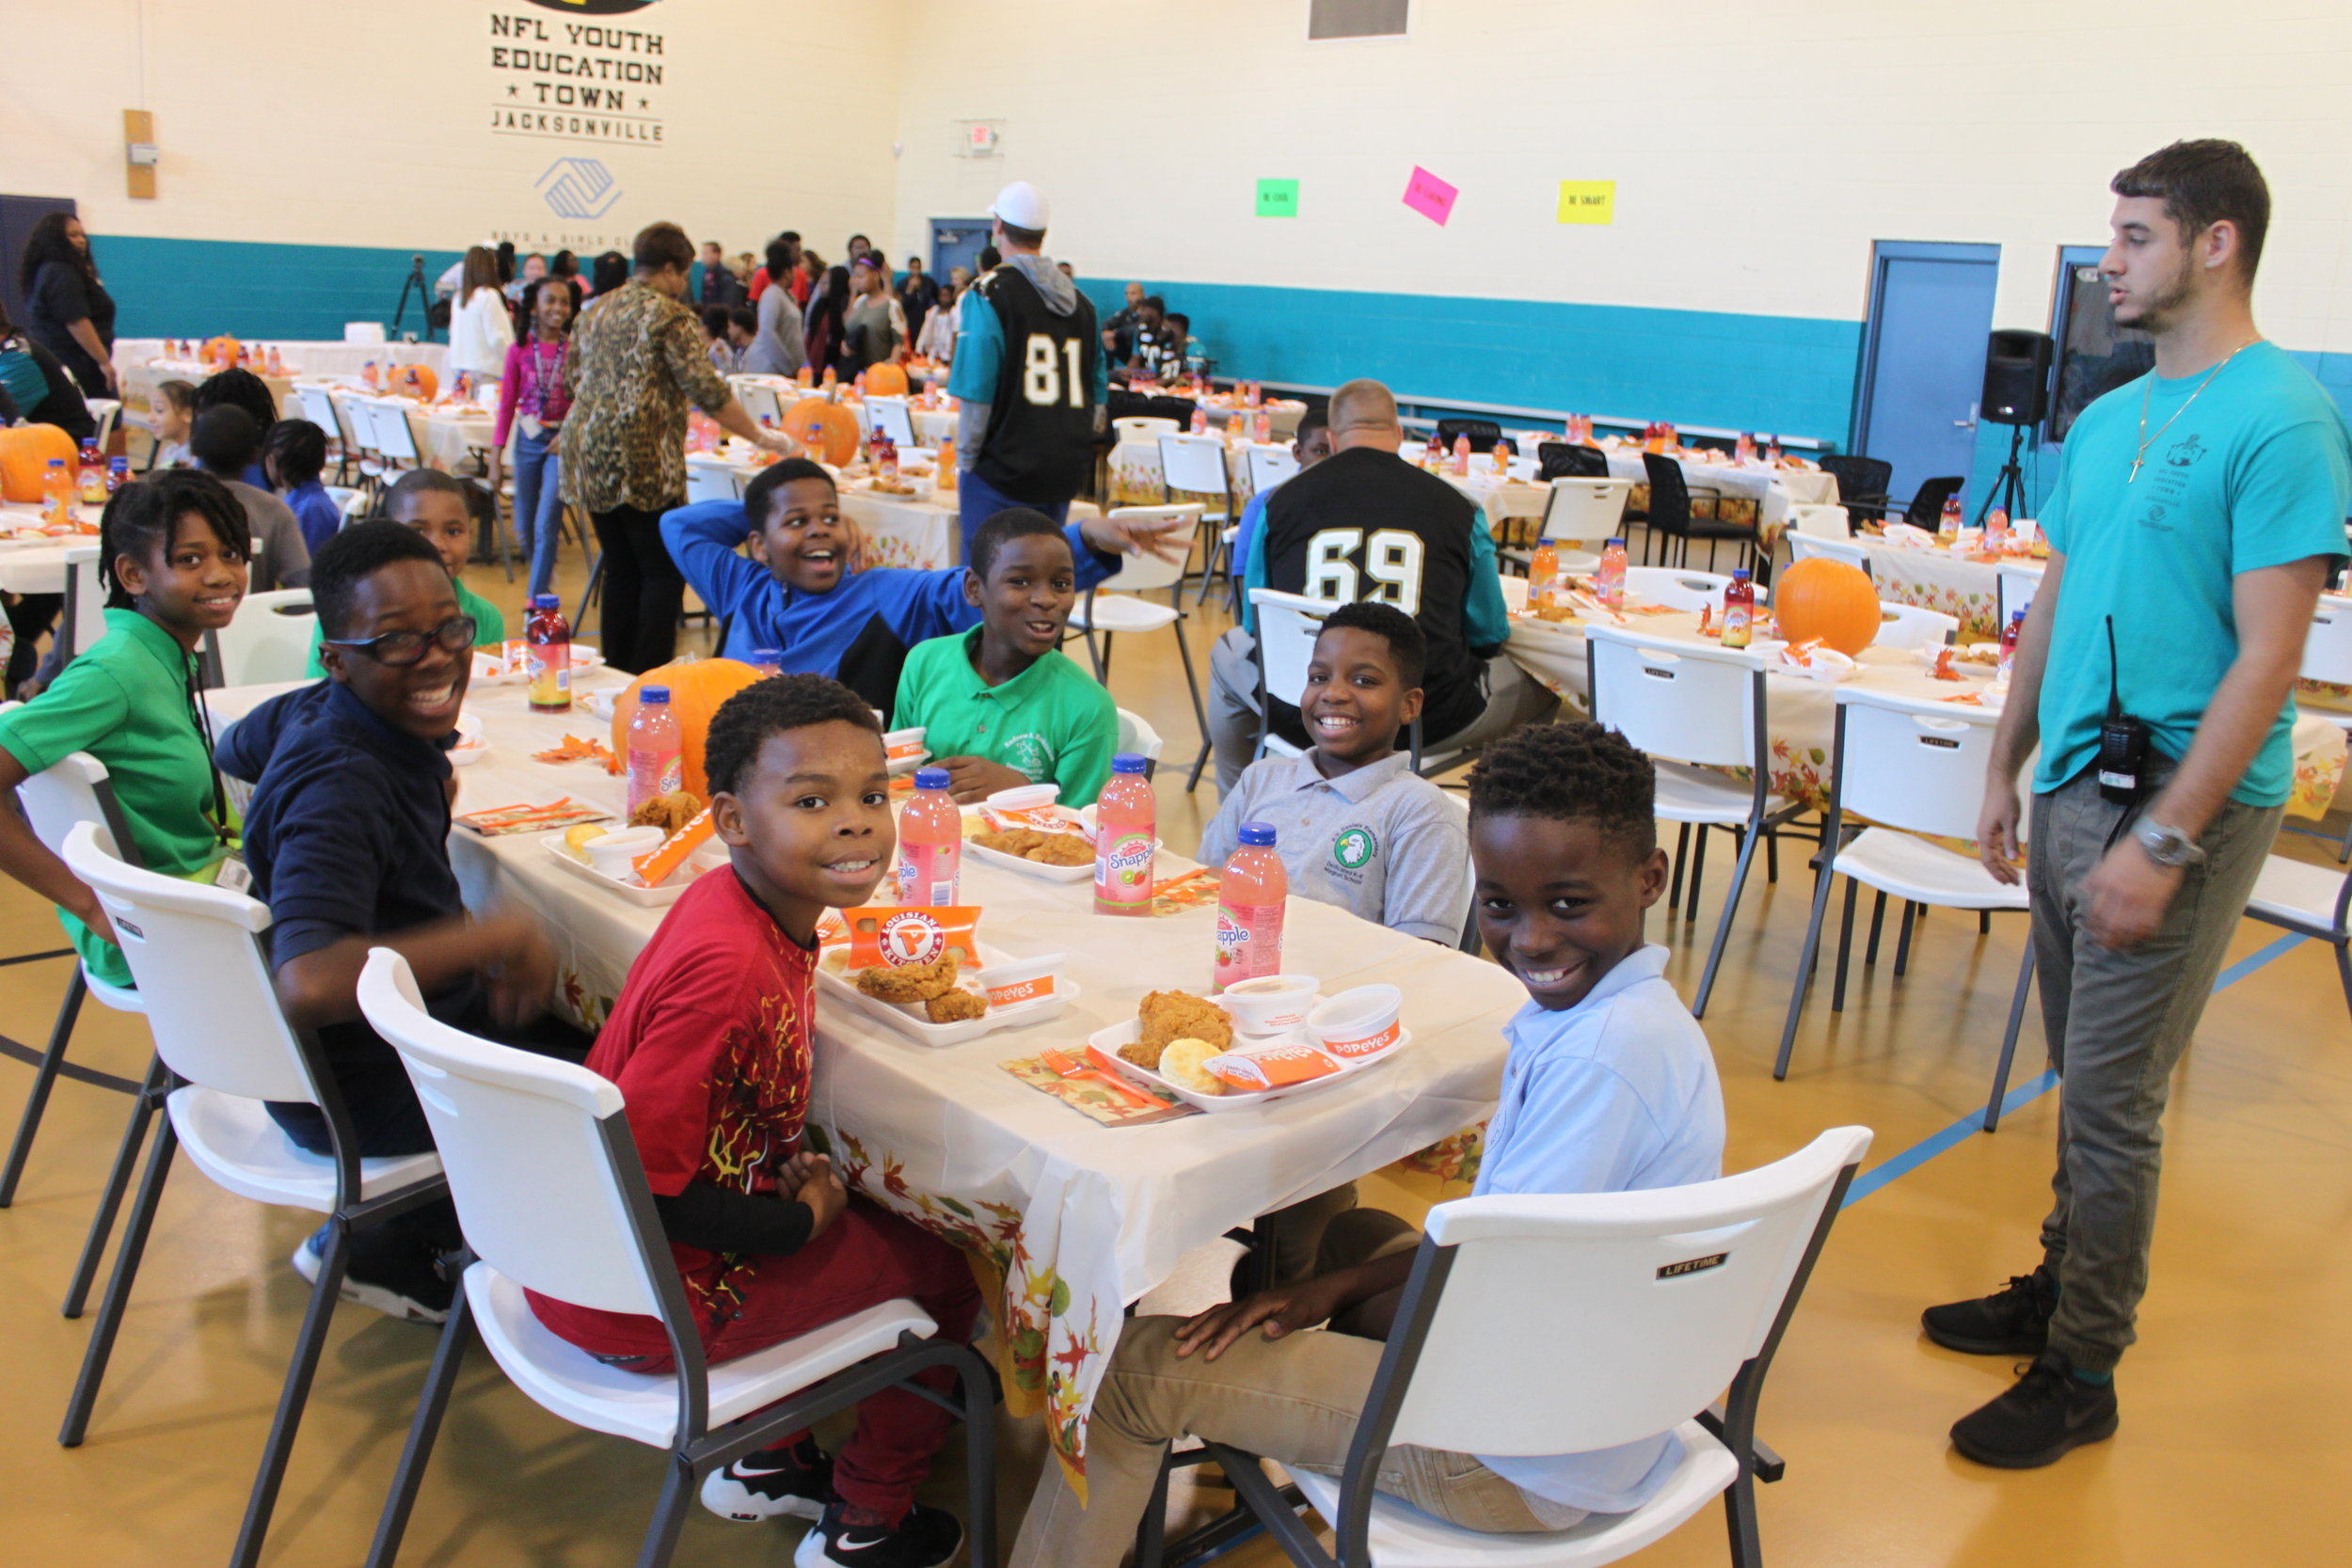 2016: Jaguars Thanksgiving for NFL YET & St. Augustine Boys & Girls Club